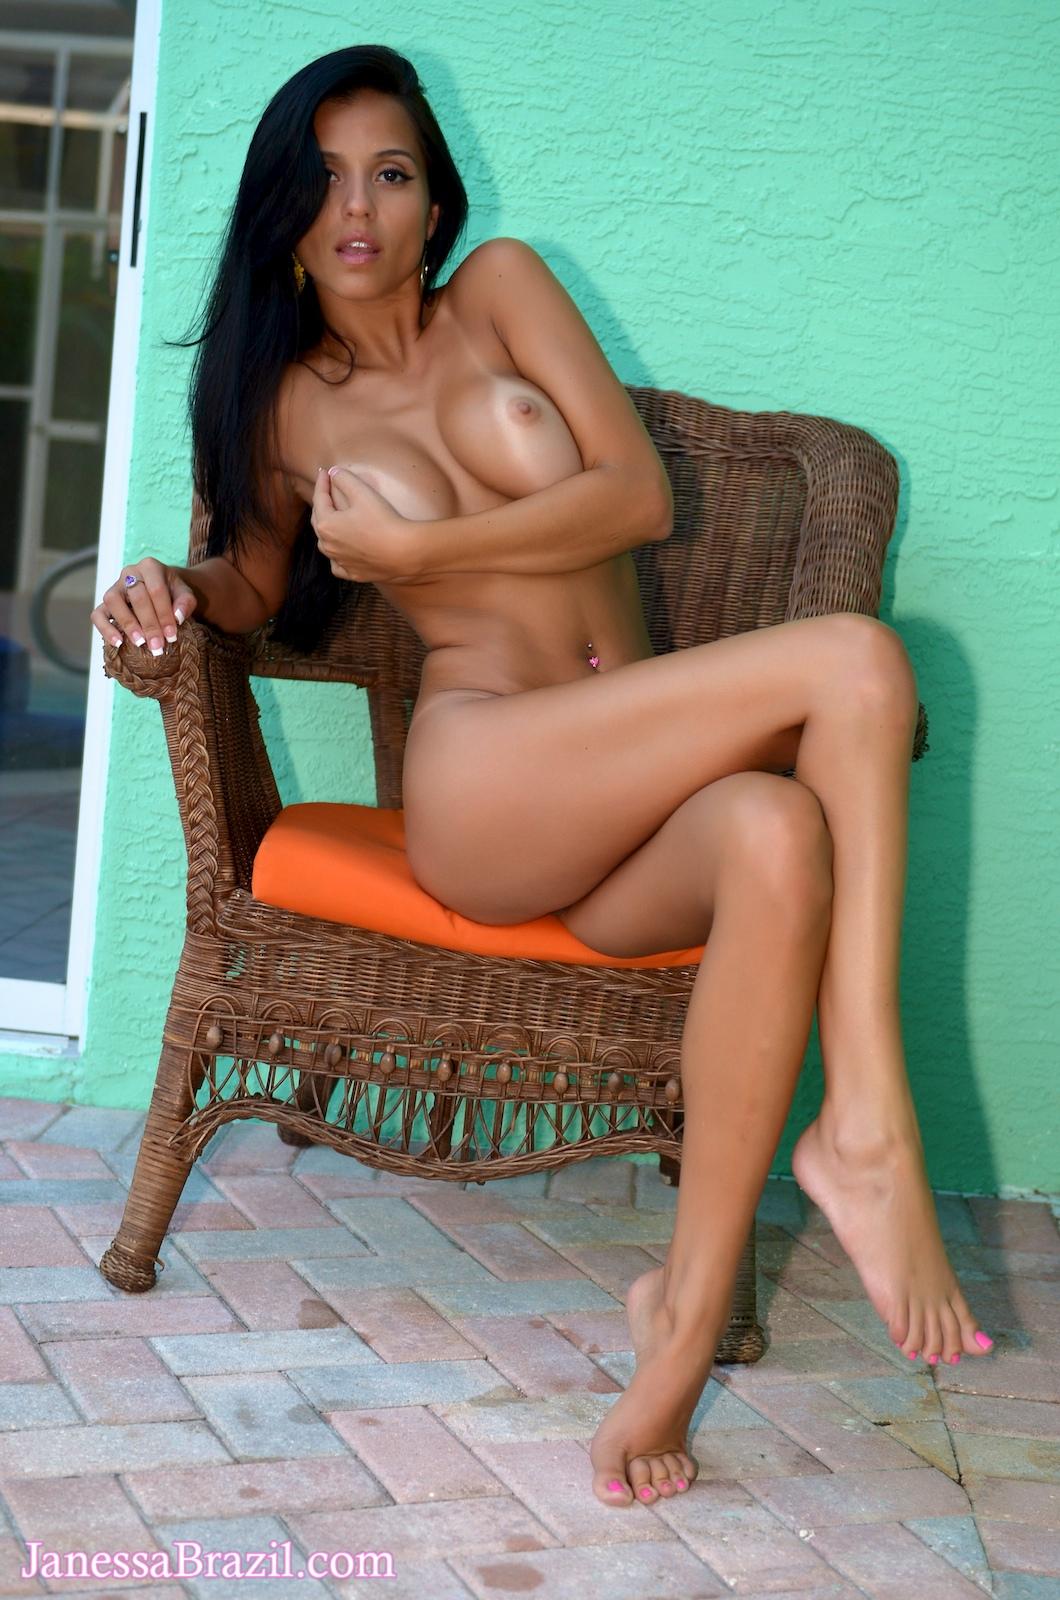 Janessa brazil posing nude